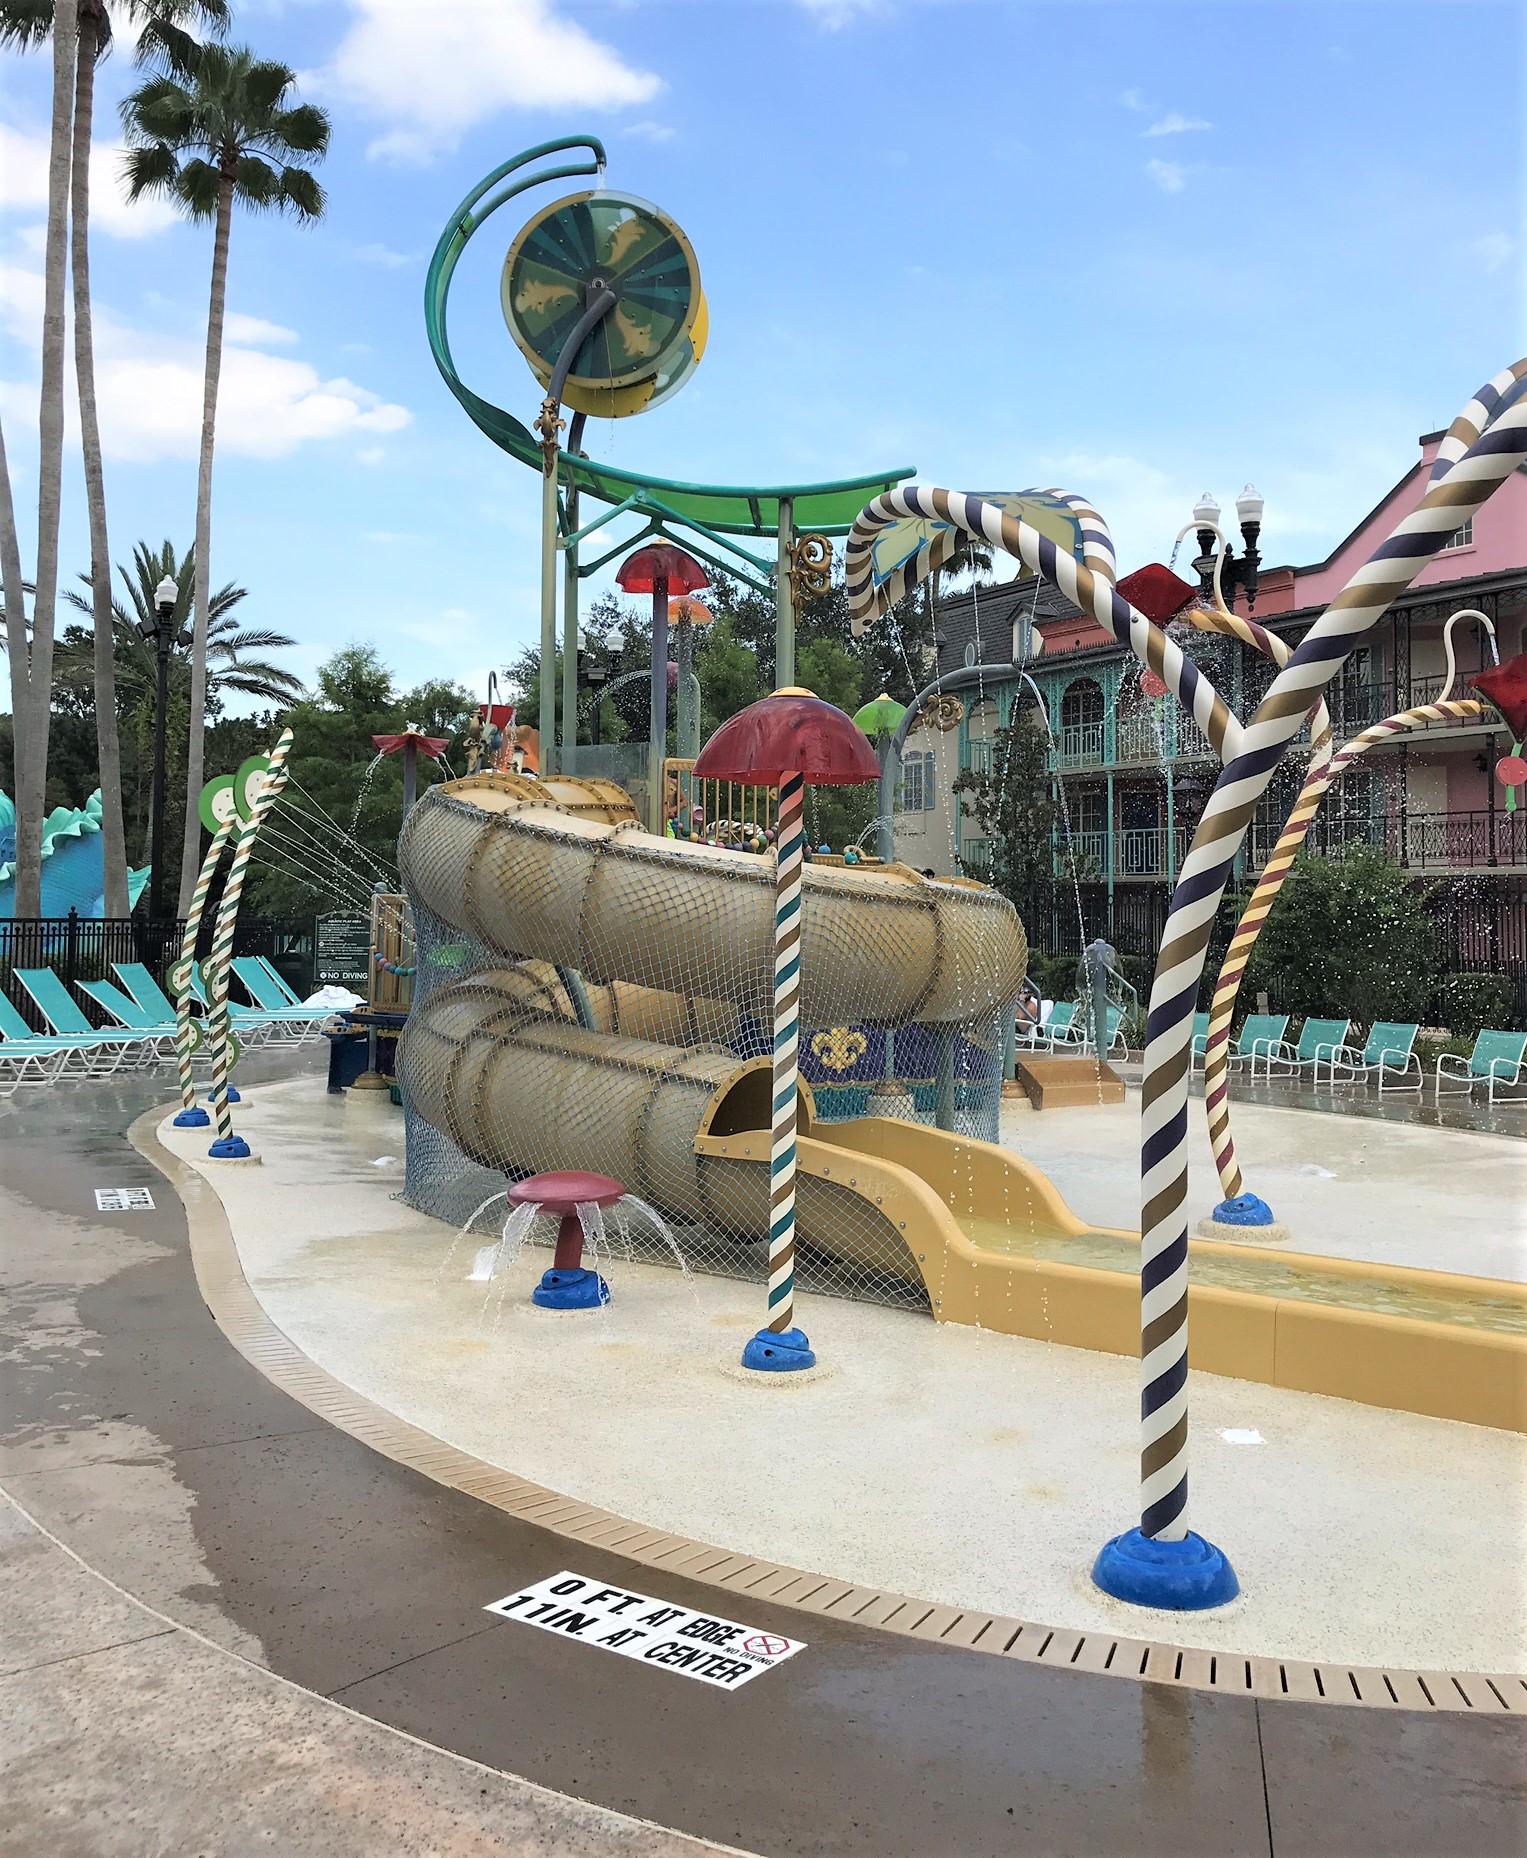 kiddie water playground and slide